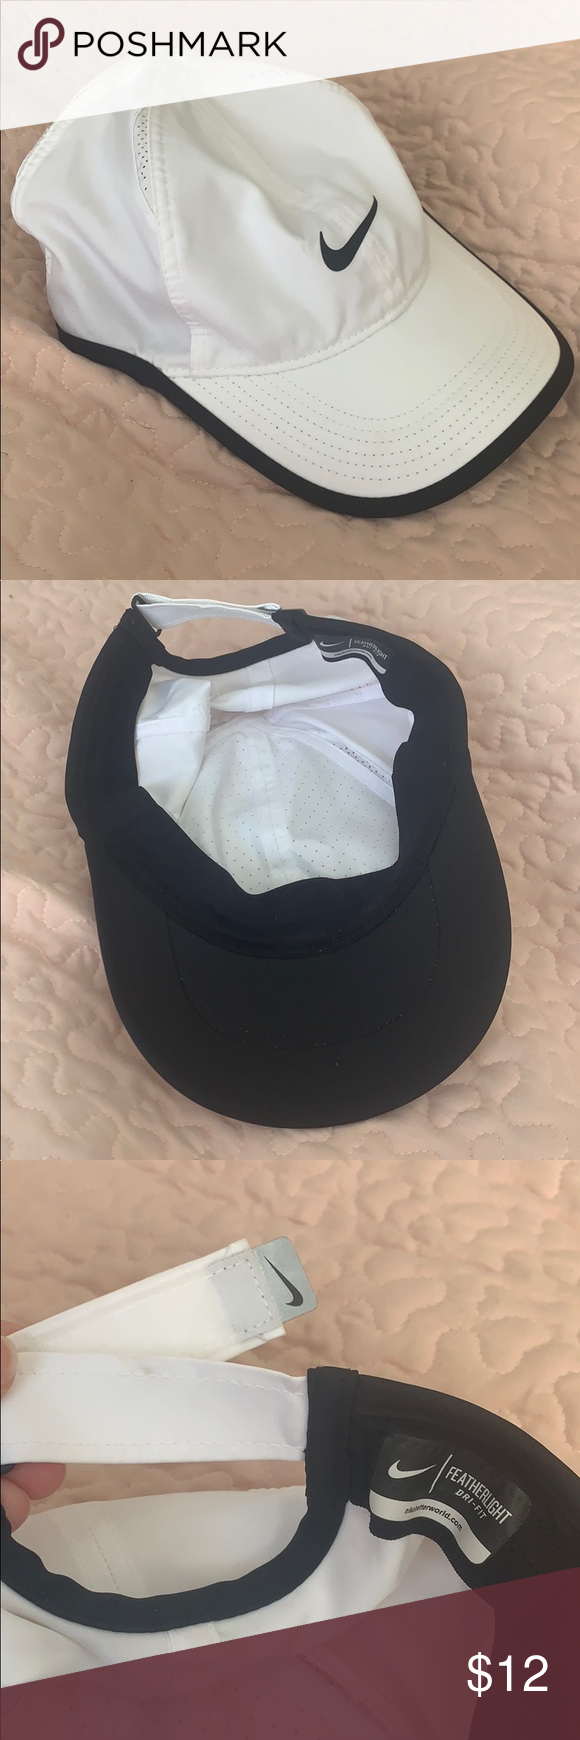 Nike Drifit Featherlight Hat In 2020 Nike Accessories Nike Women Accessories Hats